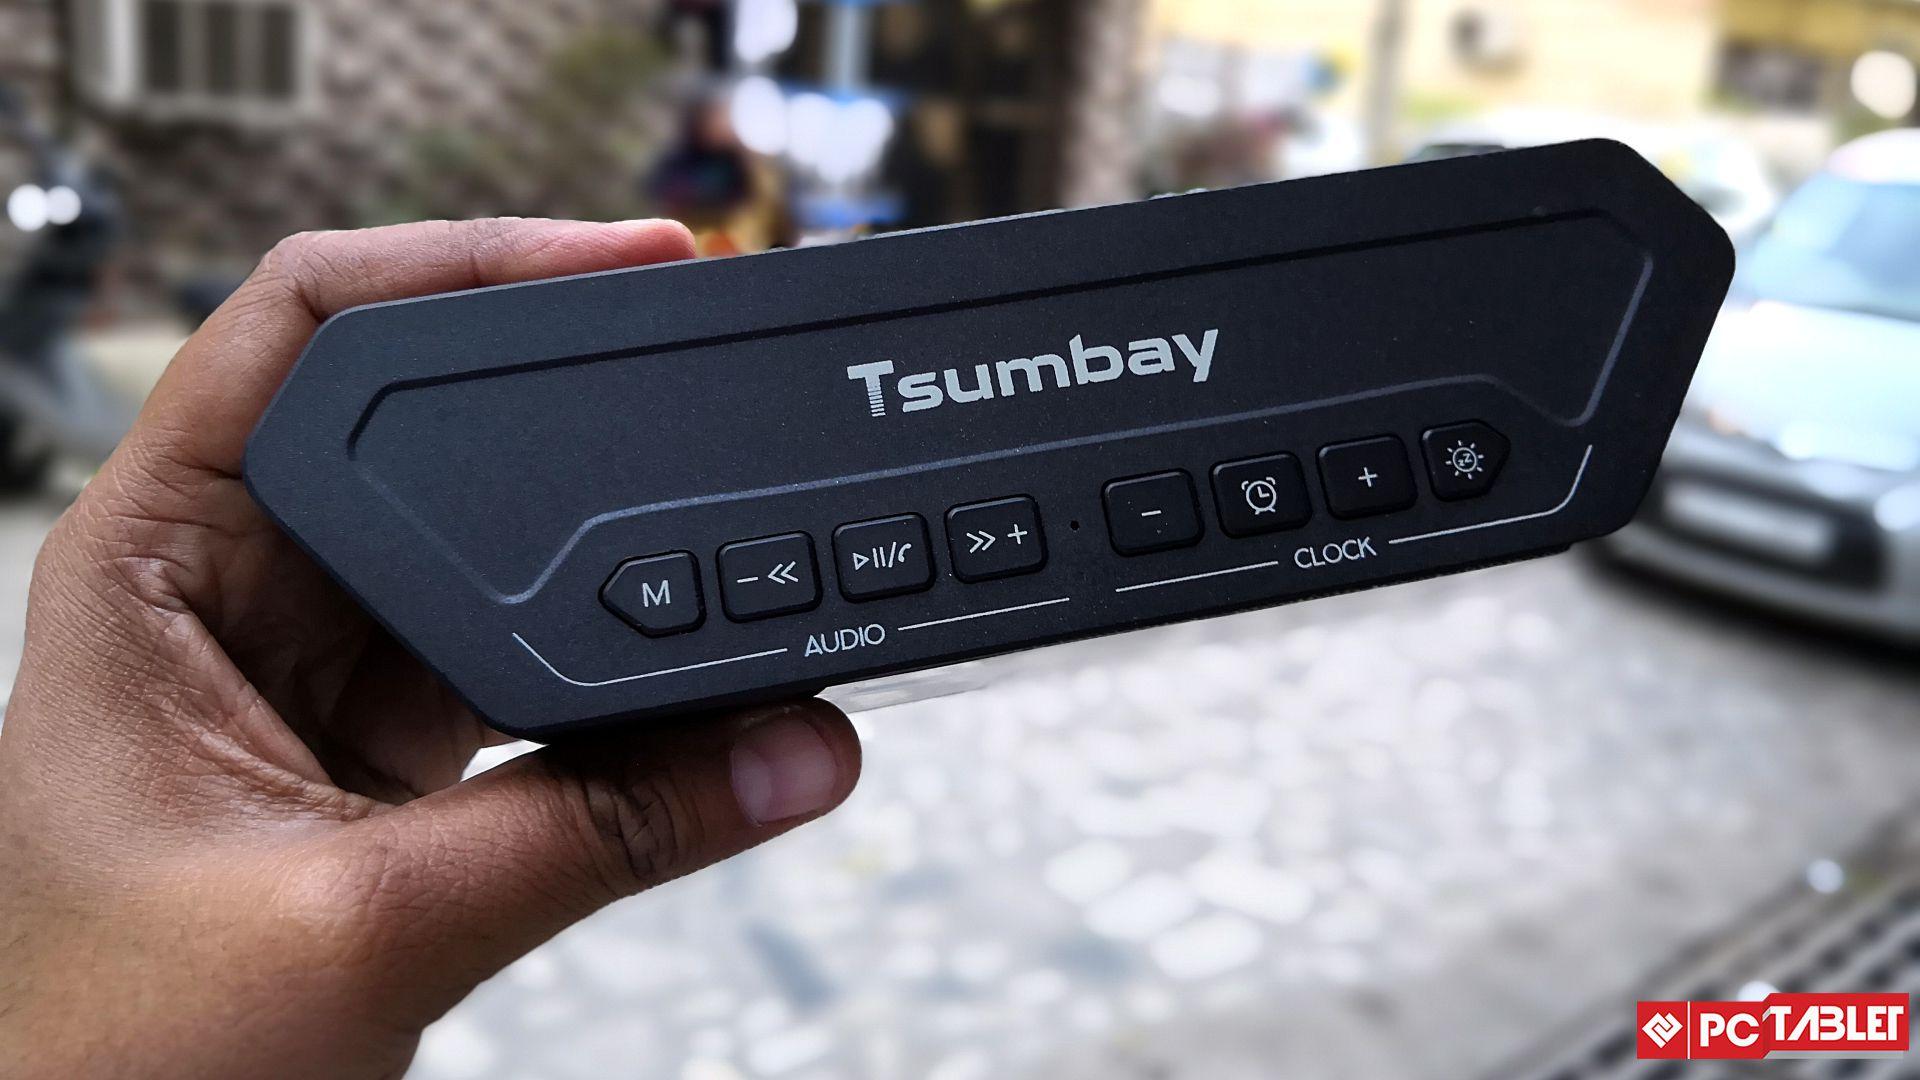 Tsumbay NX 5025 Bluetooth speaker 3